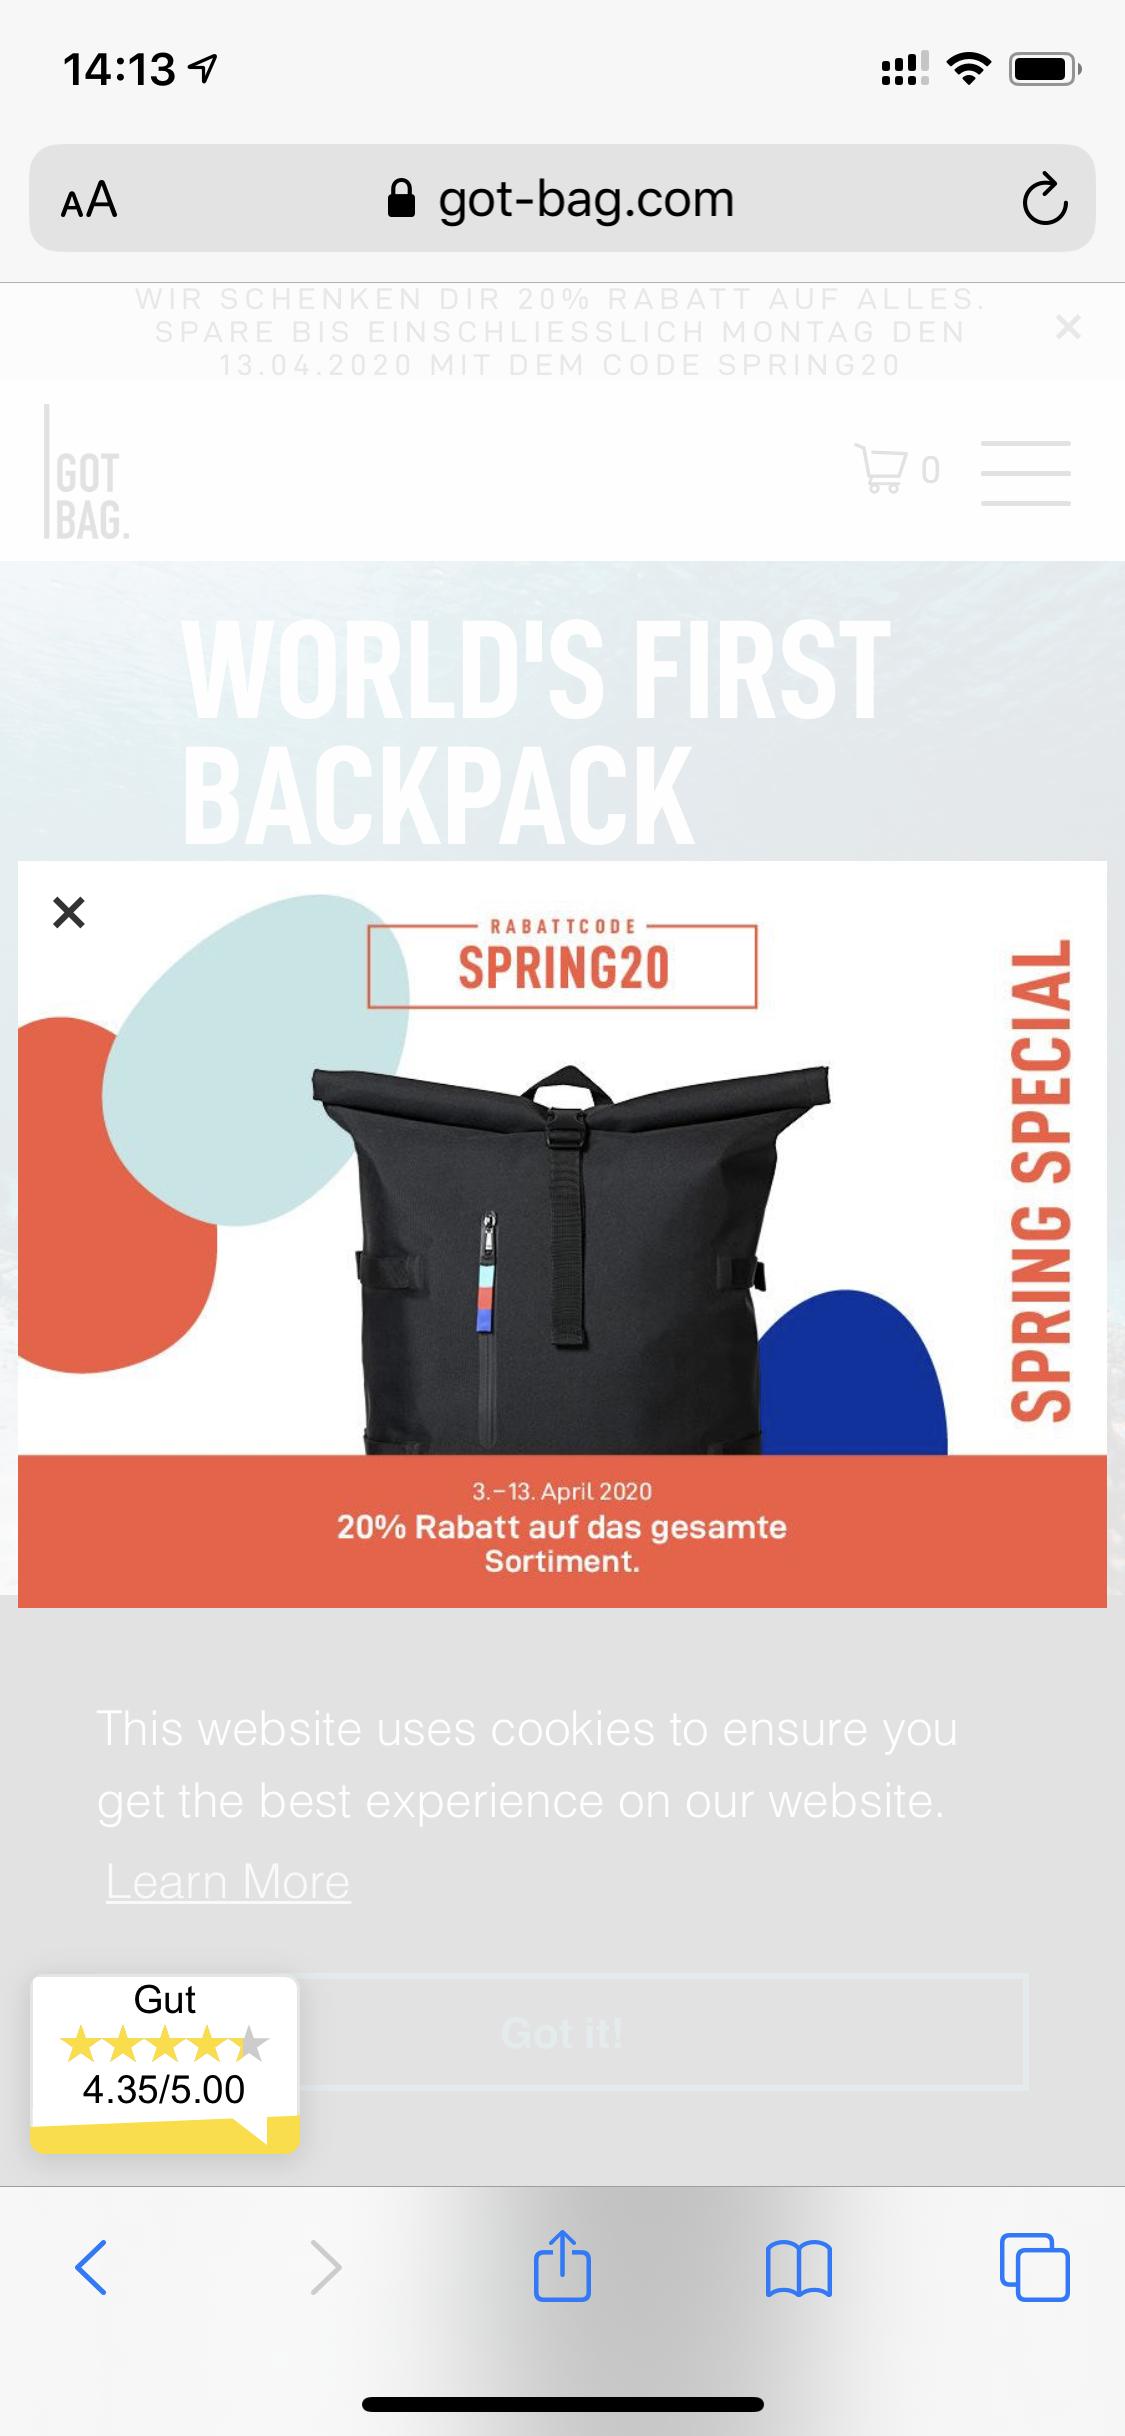 20% Rabatt auf alles von GotBag (Rucksack aus Meeresplastik)